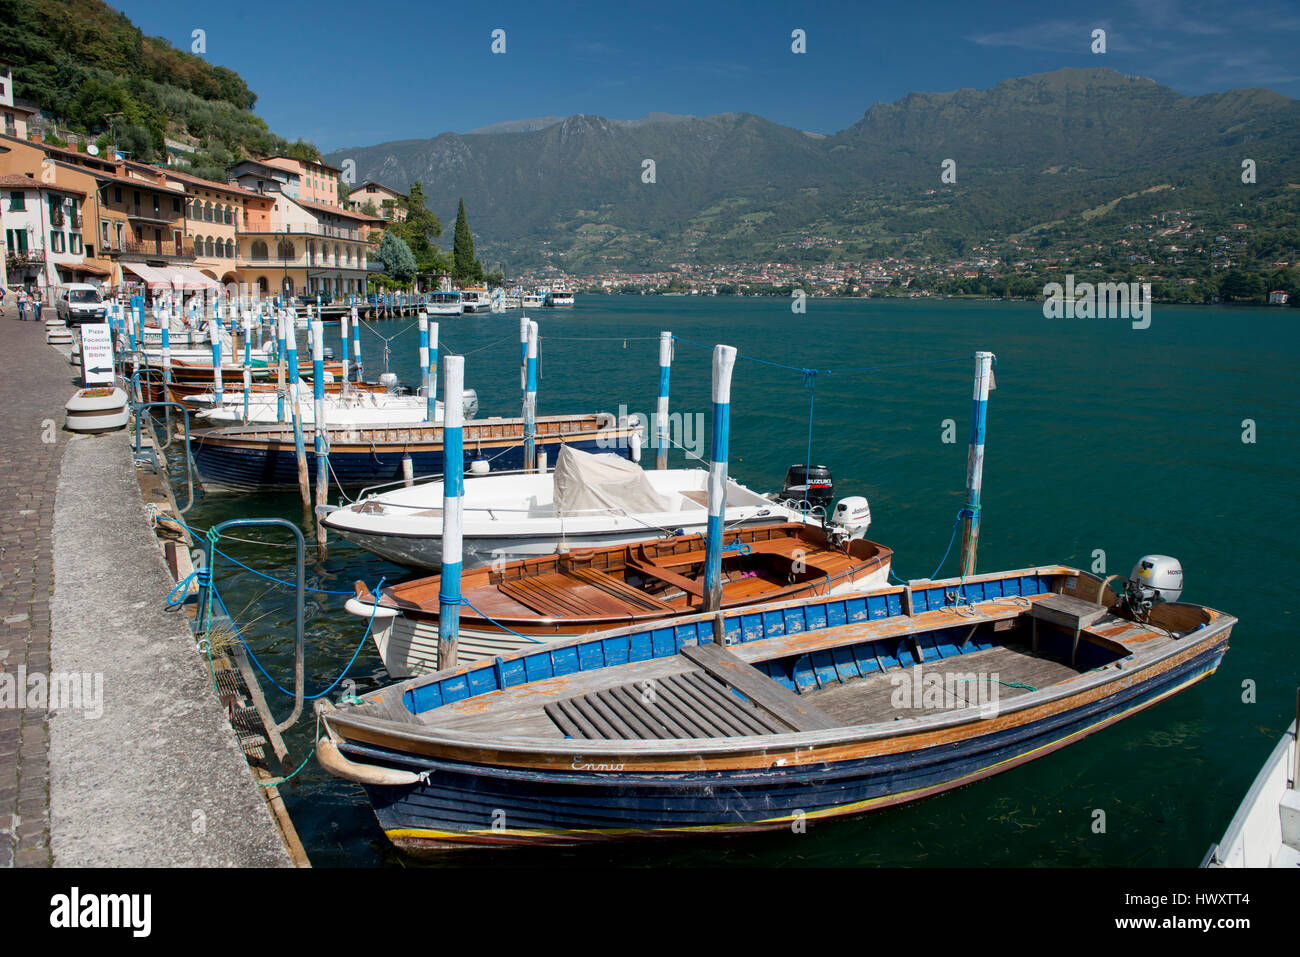 Peschiera Maraglio, village on Montisola, on the Iseo Lake, Italy - Stock Image